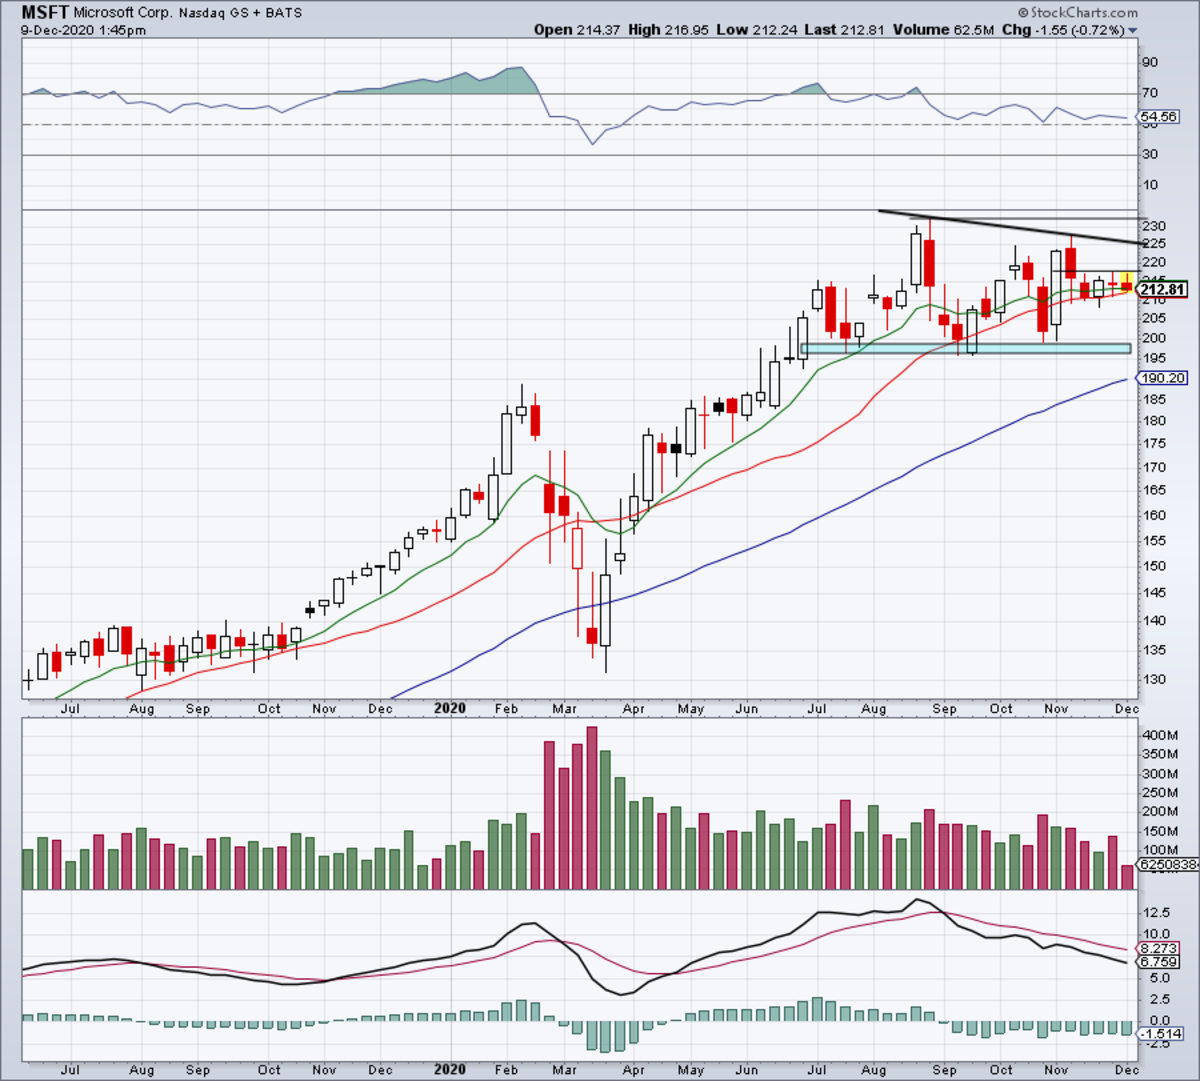 Weekly chart of Microsoft stock.